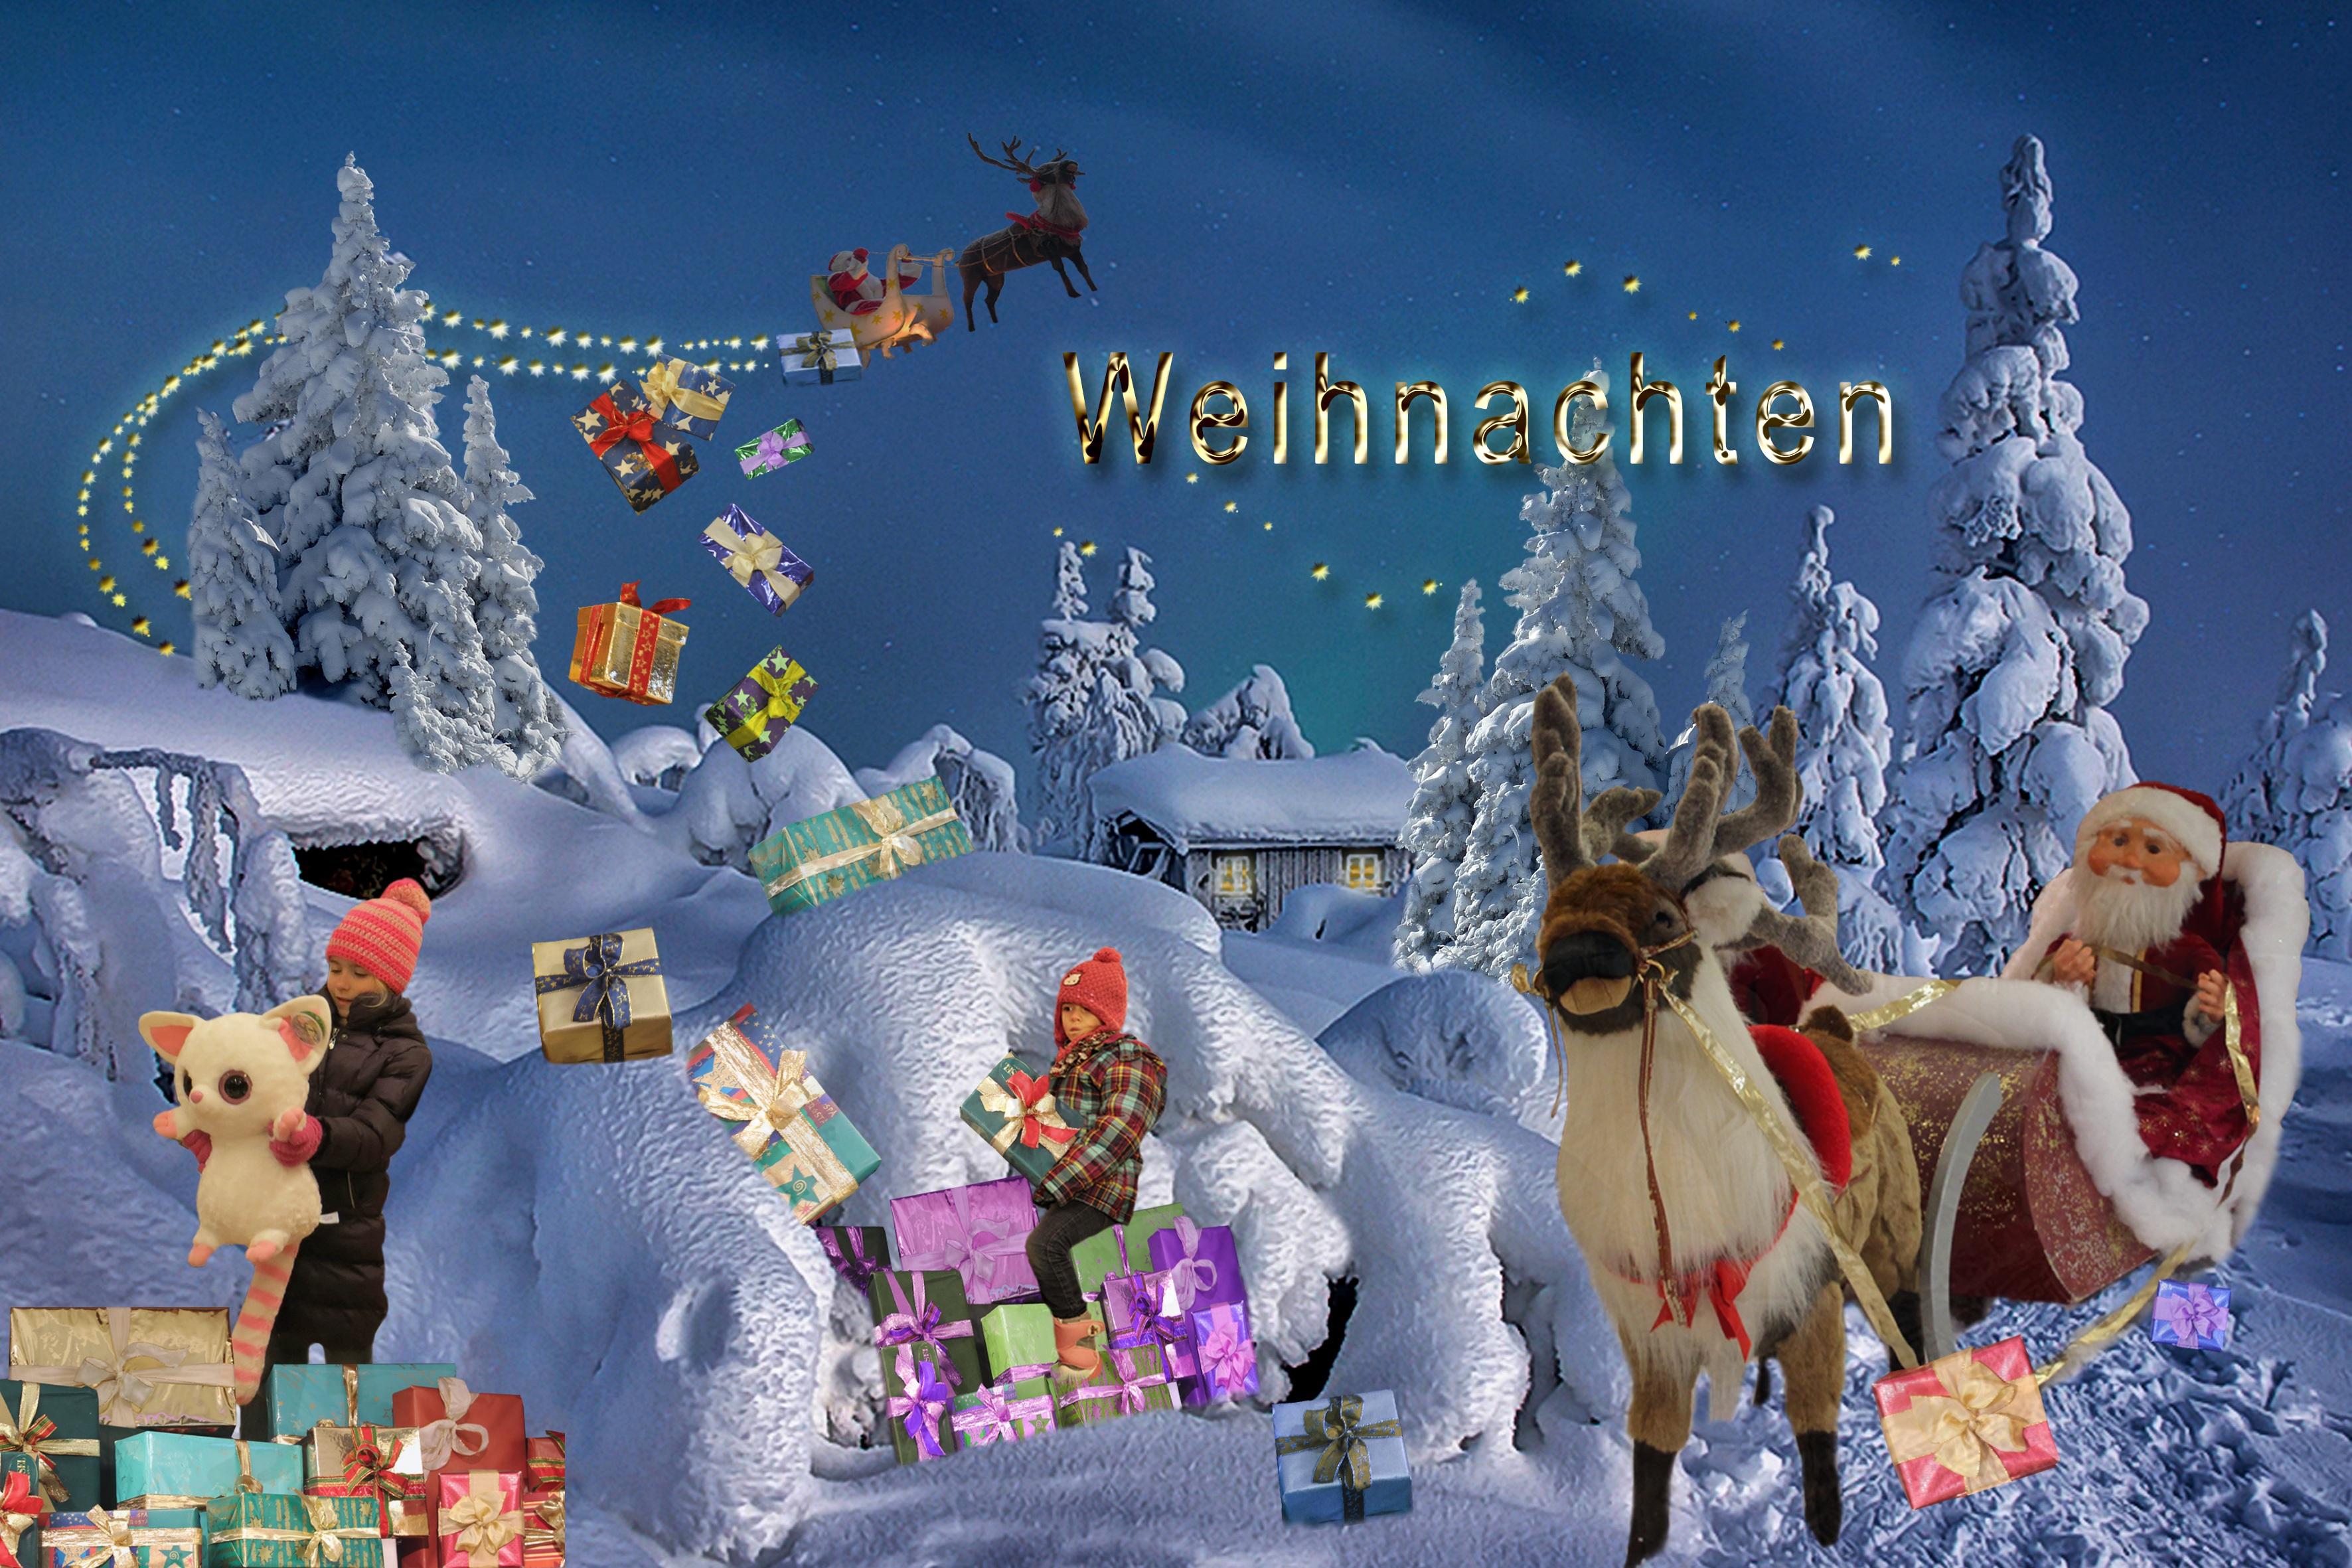 Christmas Card, Card, Christmas, Paper, Sale, HQ Photo